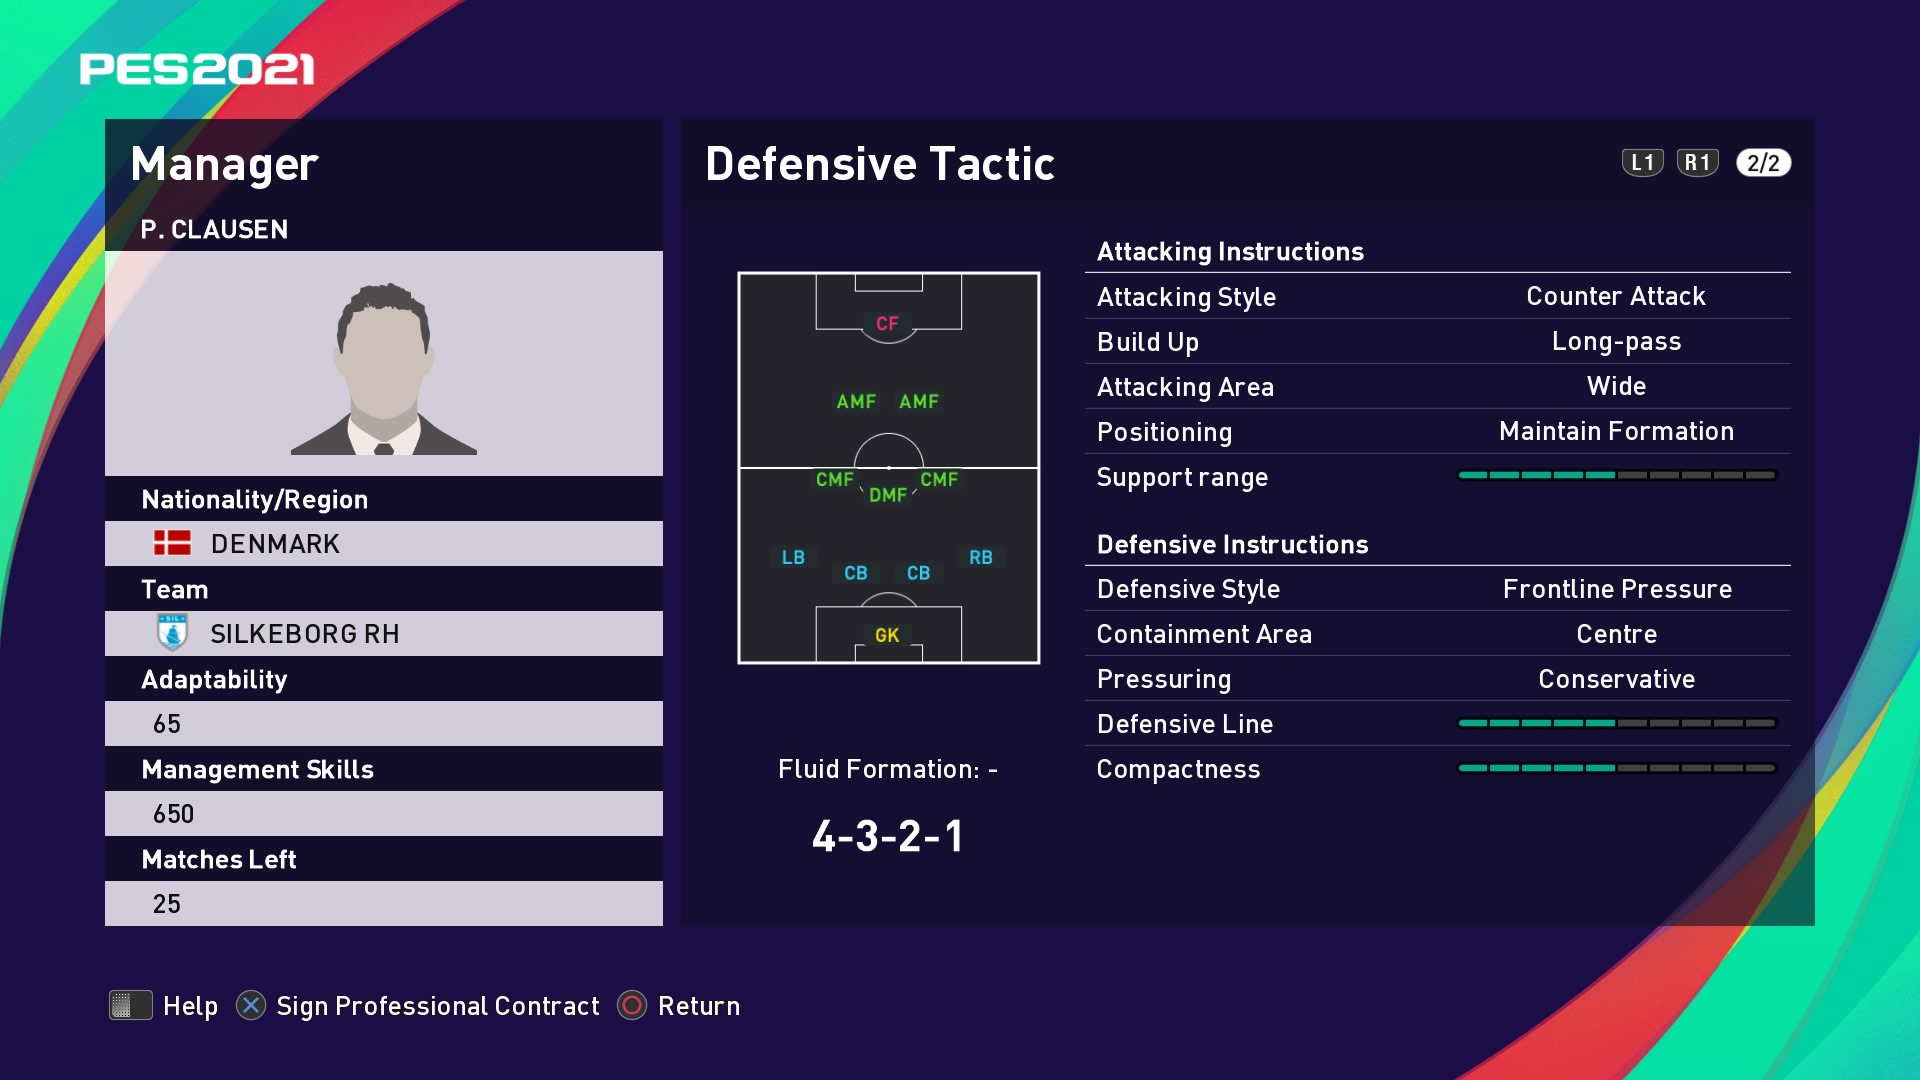 P. Clausen (Kent Nielsen) Defensive Tactic in PES 2021 myClub